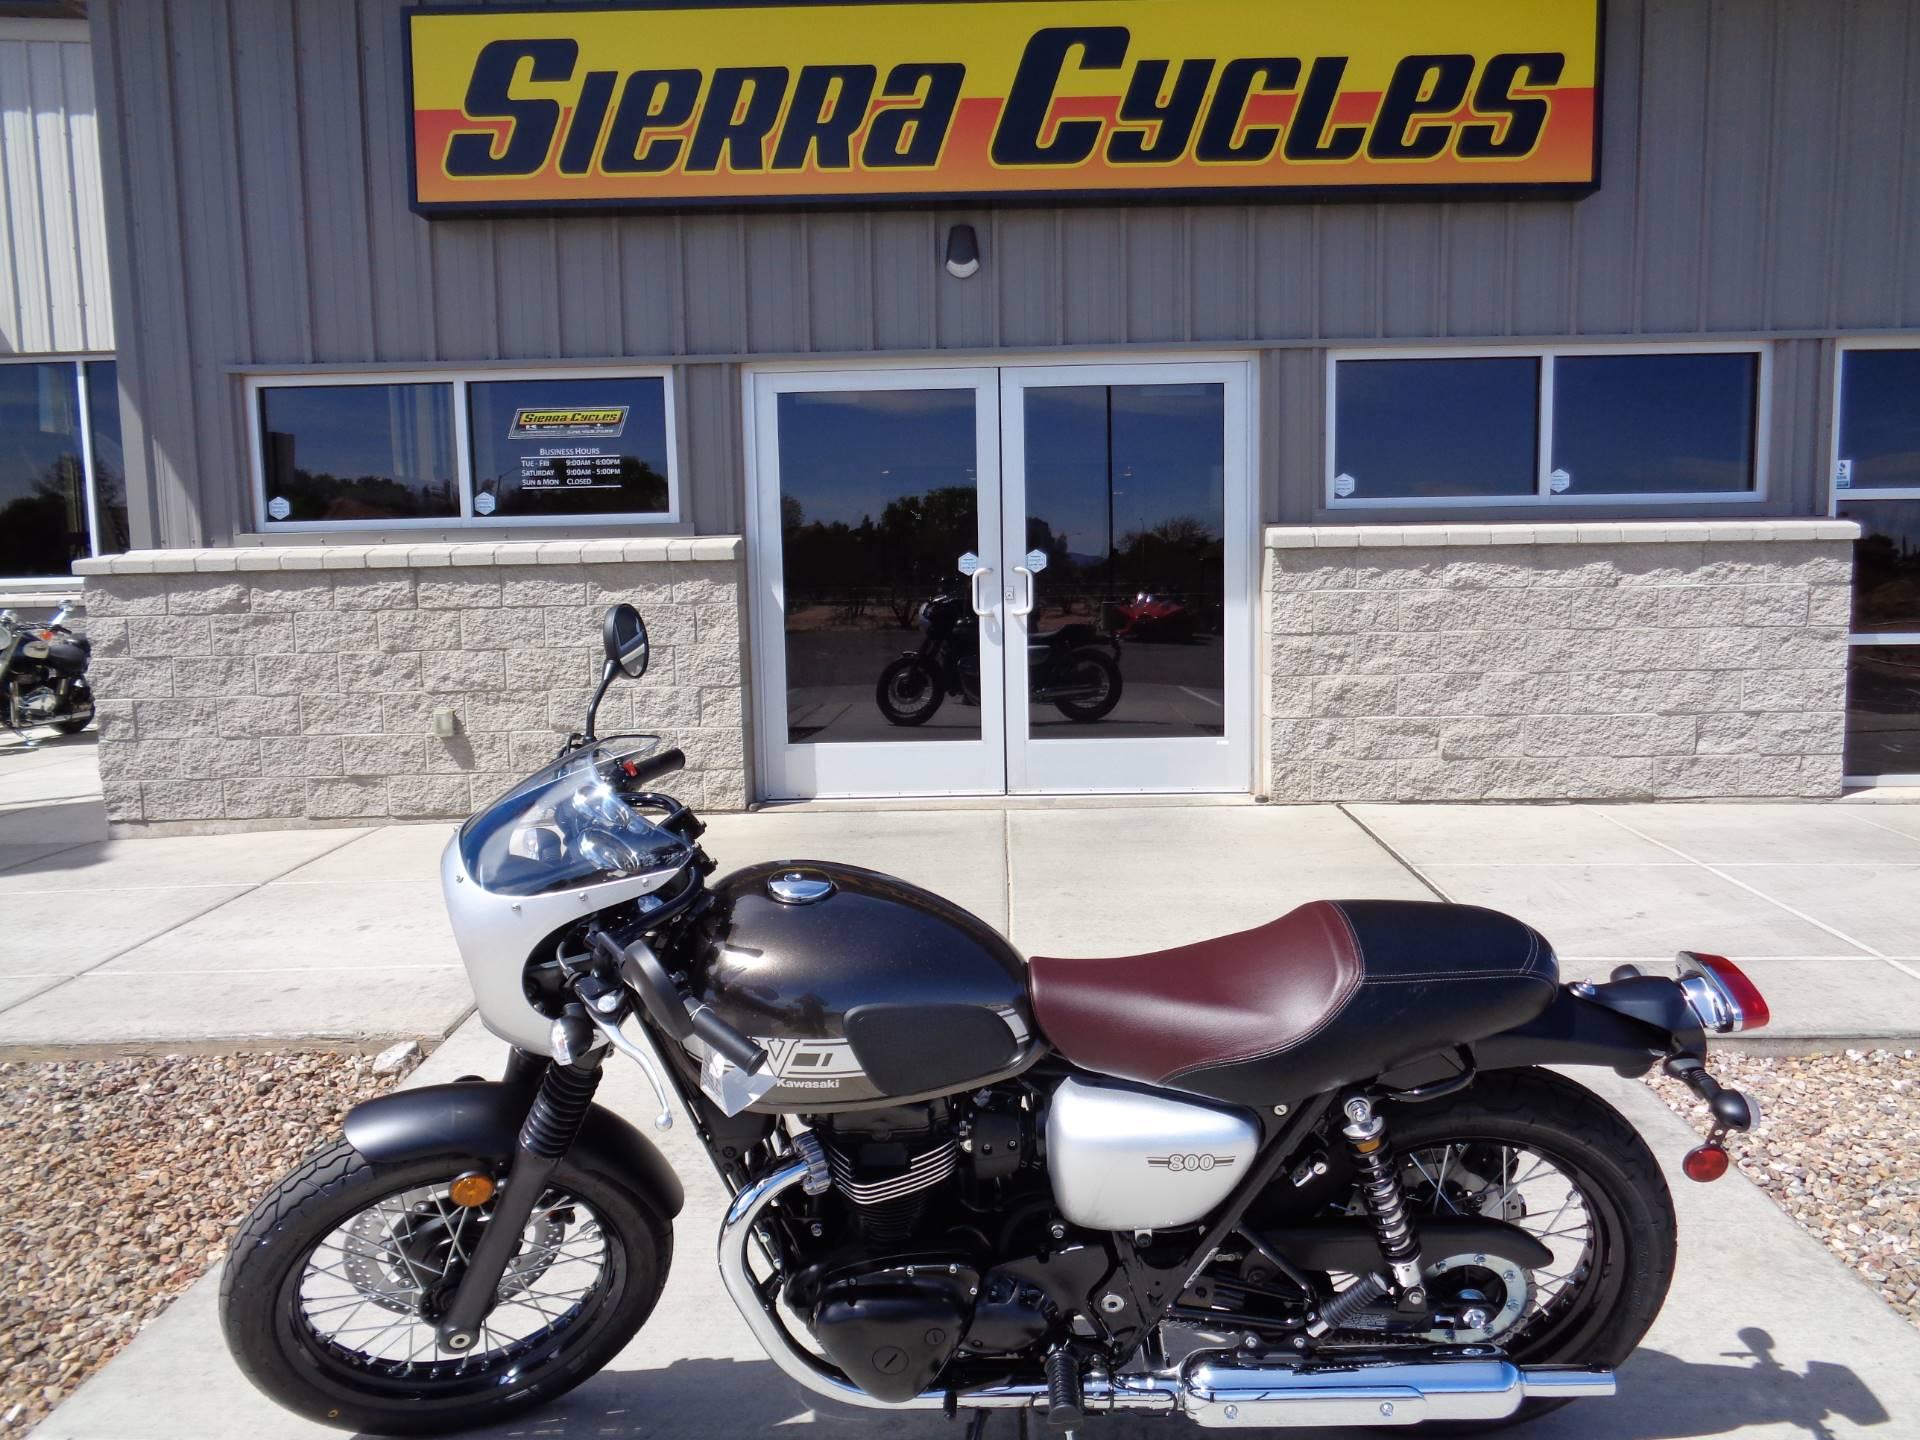 New 2019 Kawasaki W800 Cafe Motorcycles In Sierra Vista Az Stock